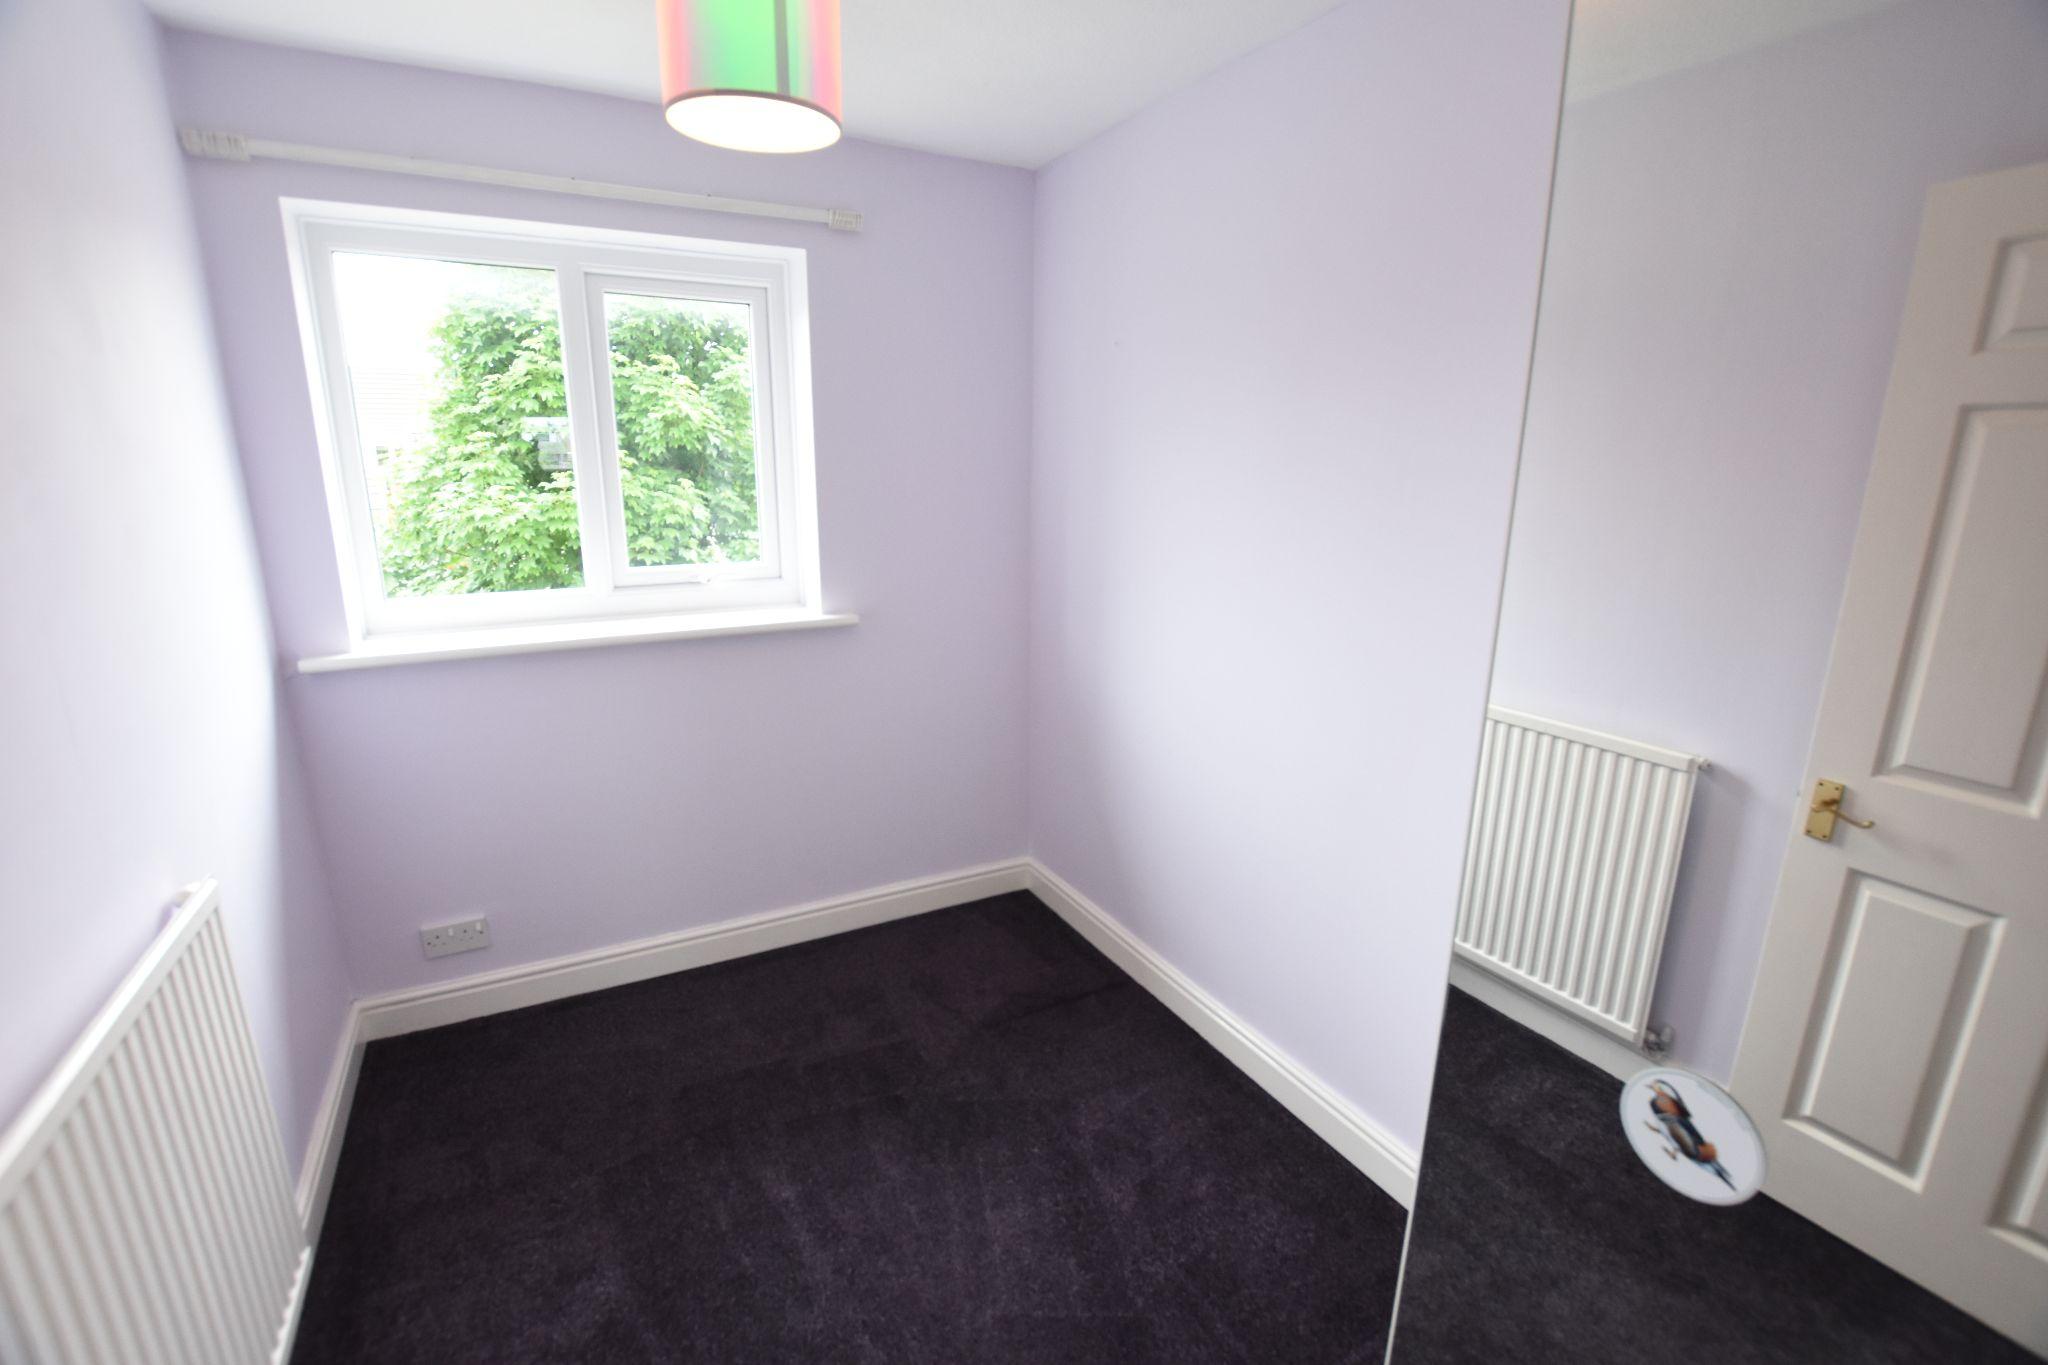 4 bedroom detached house Sold STC in Preston - Bedroom 3